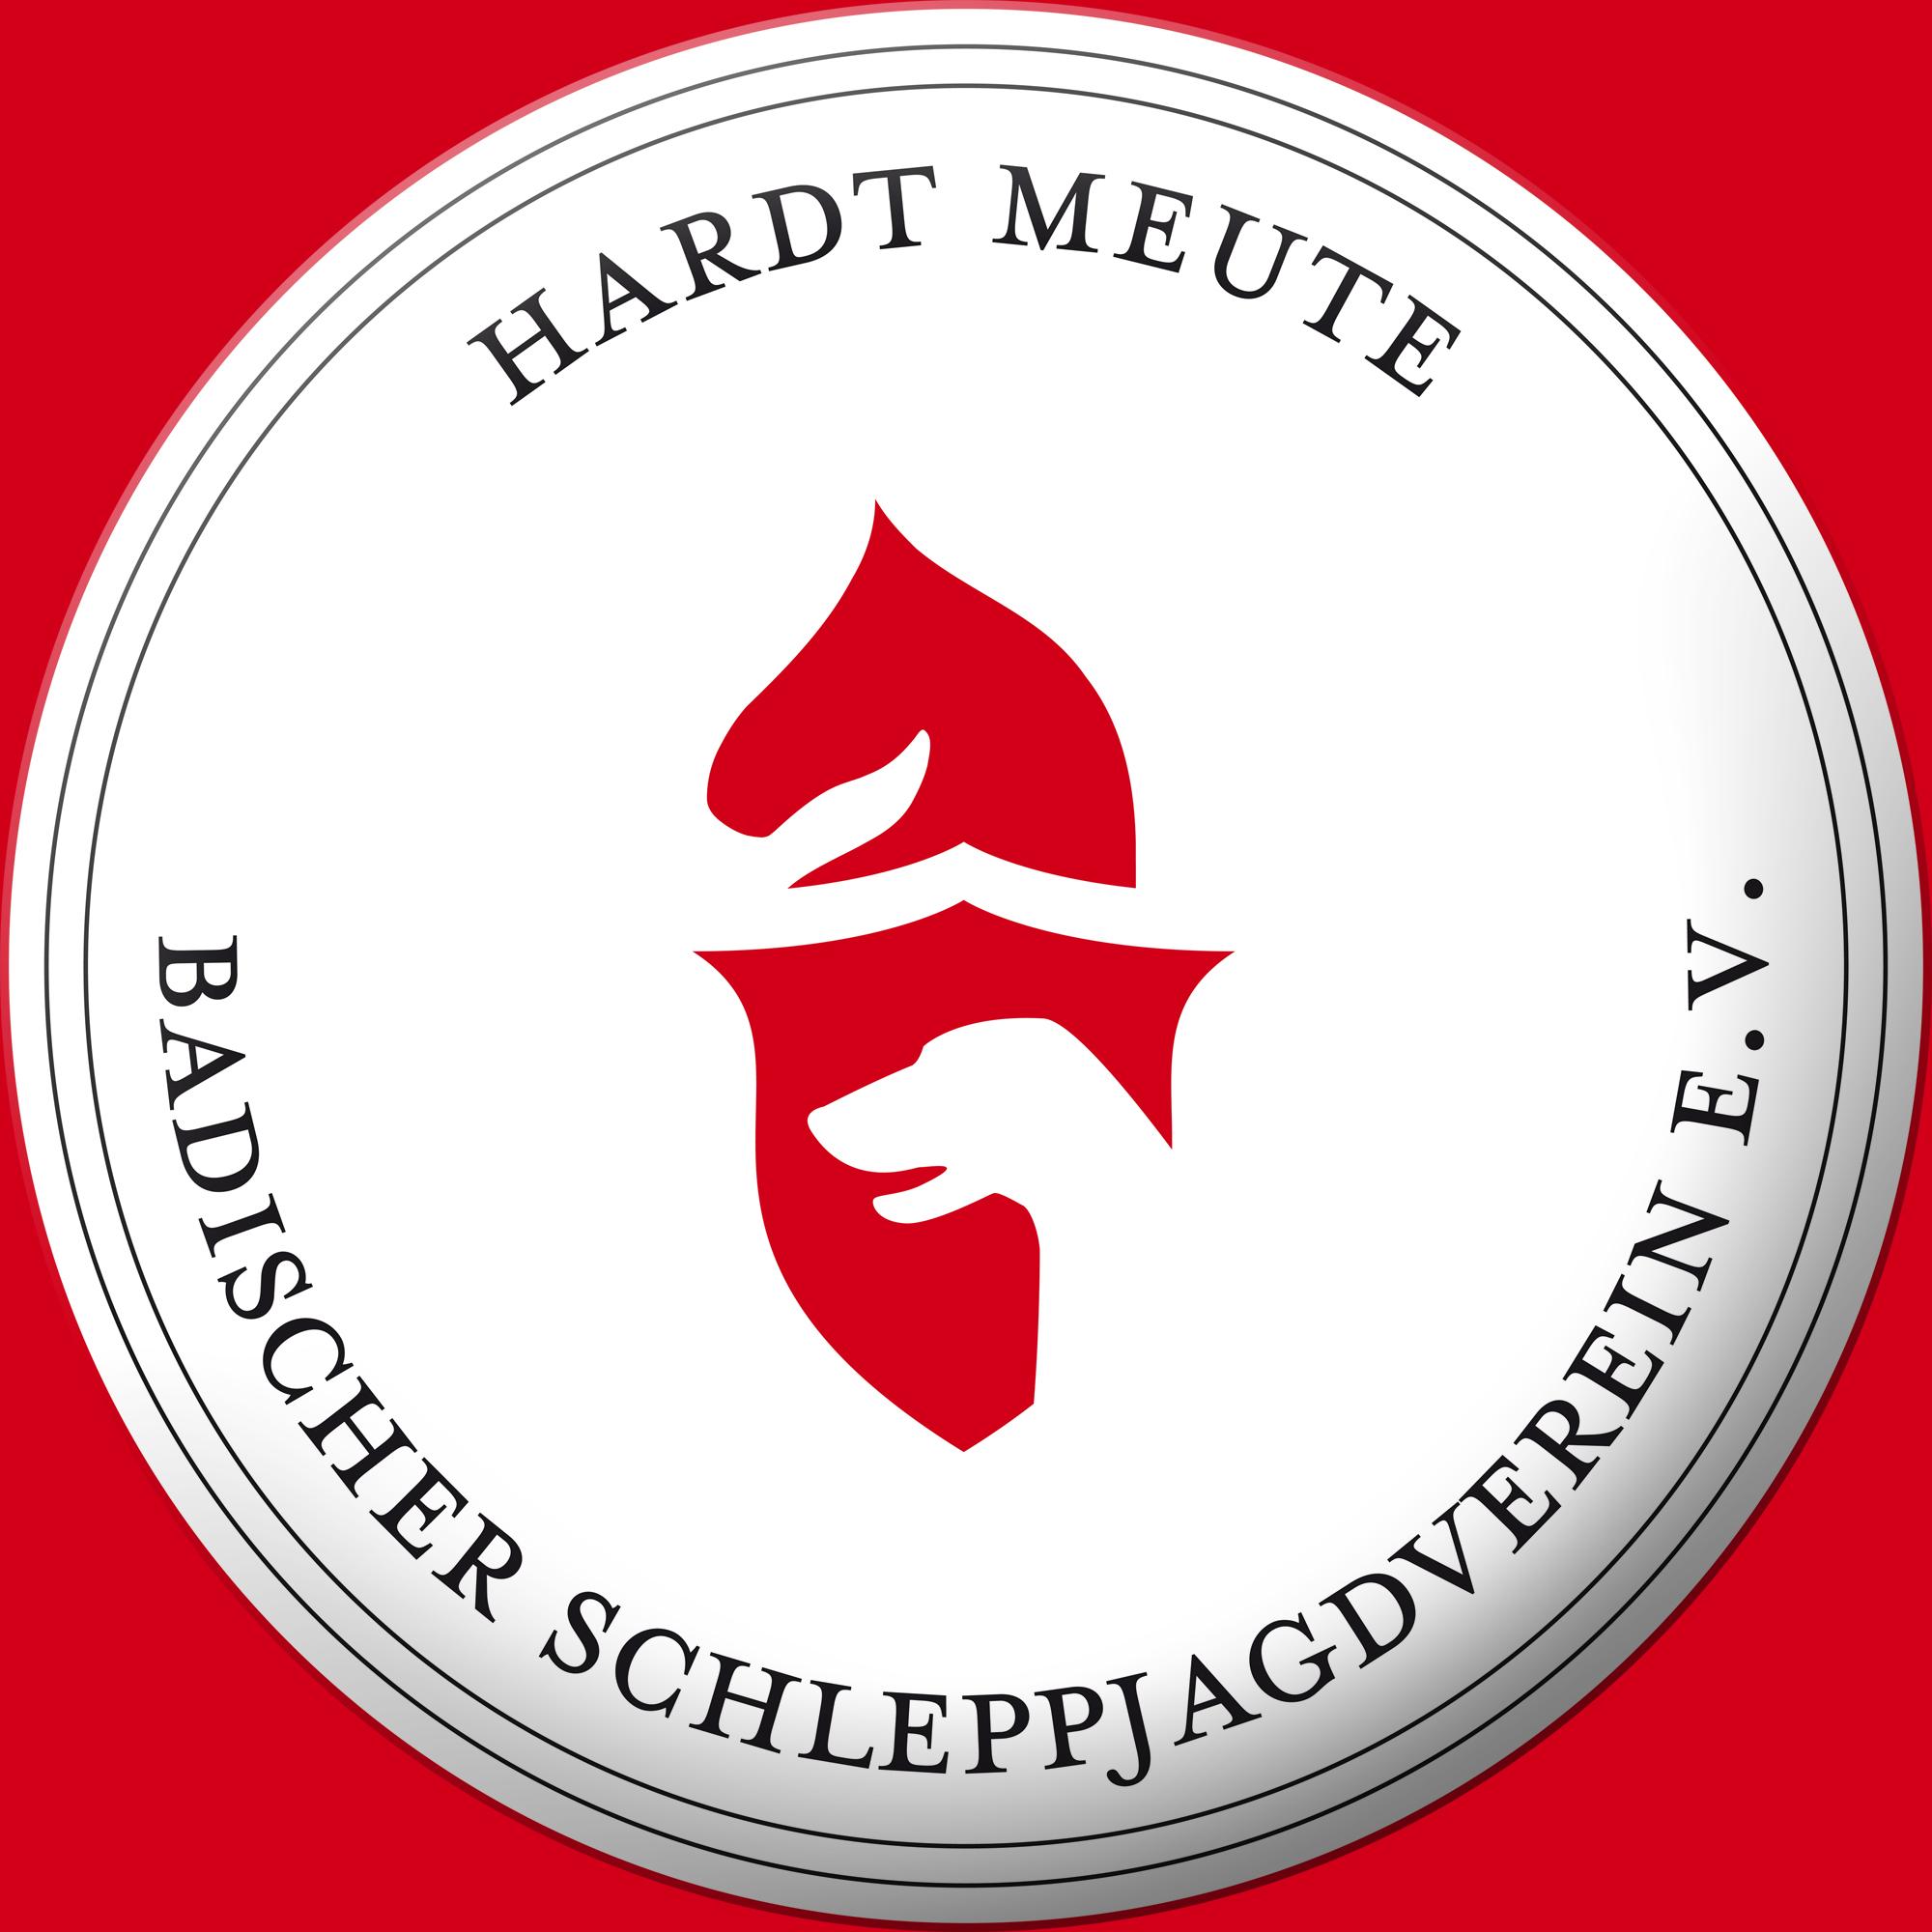 logo_4xKontur_ebenen_bearbeitet-1